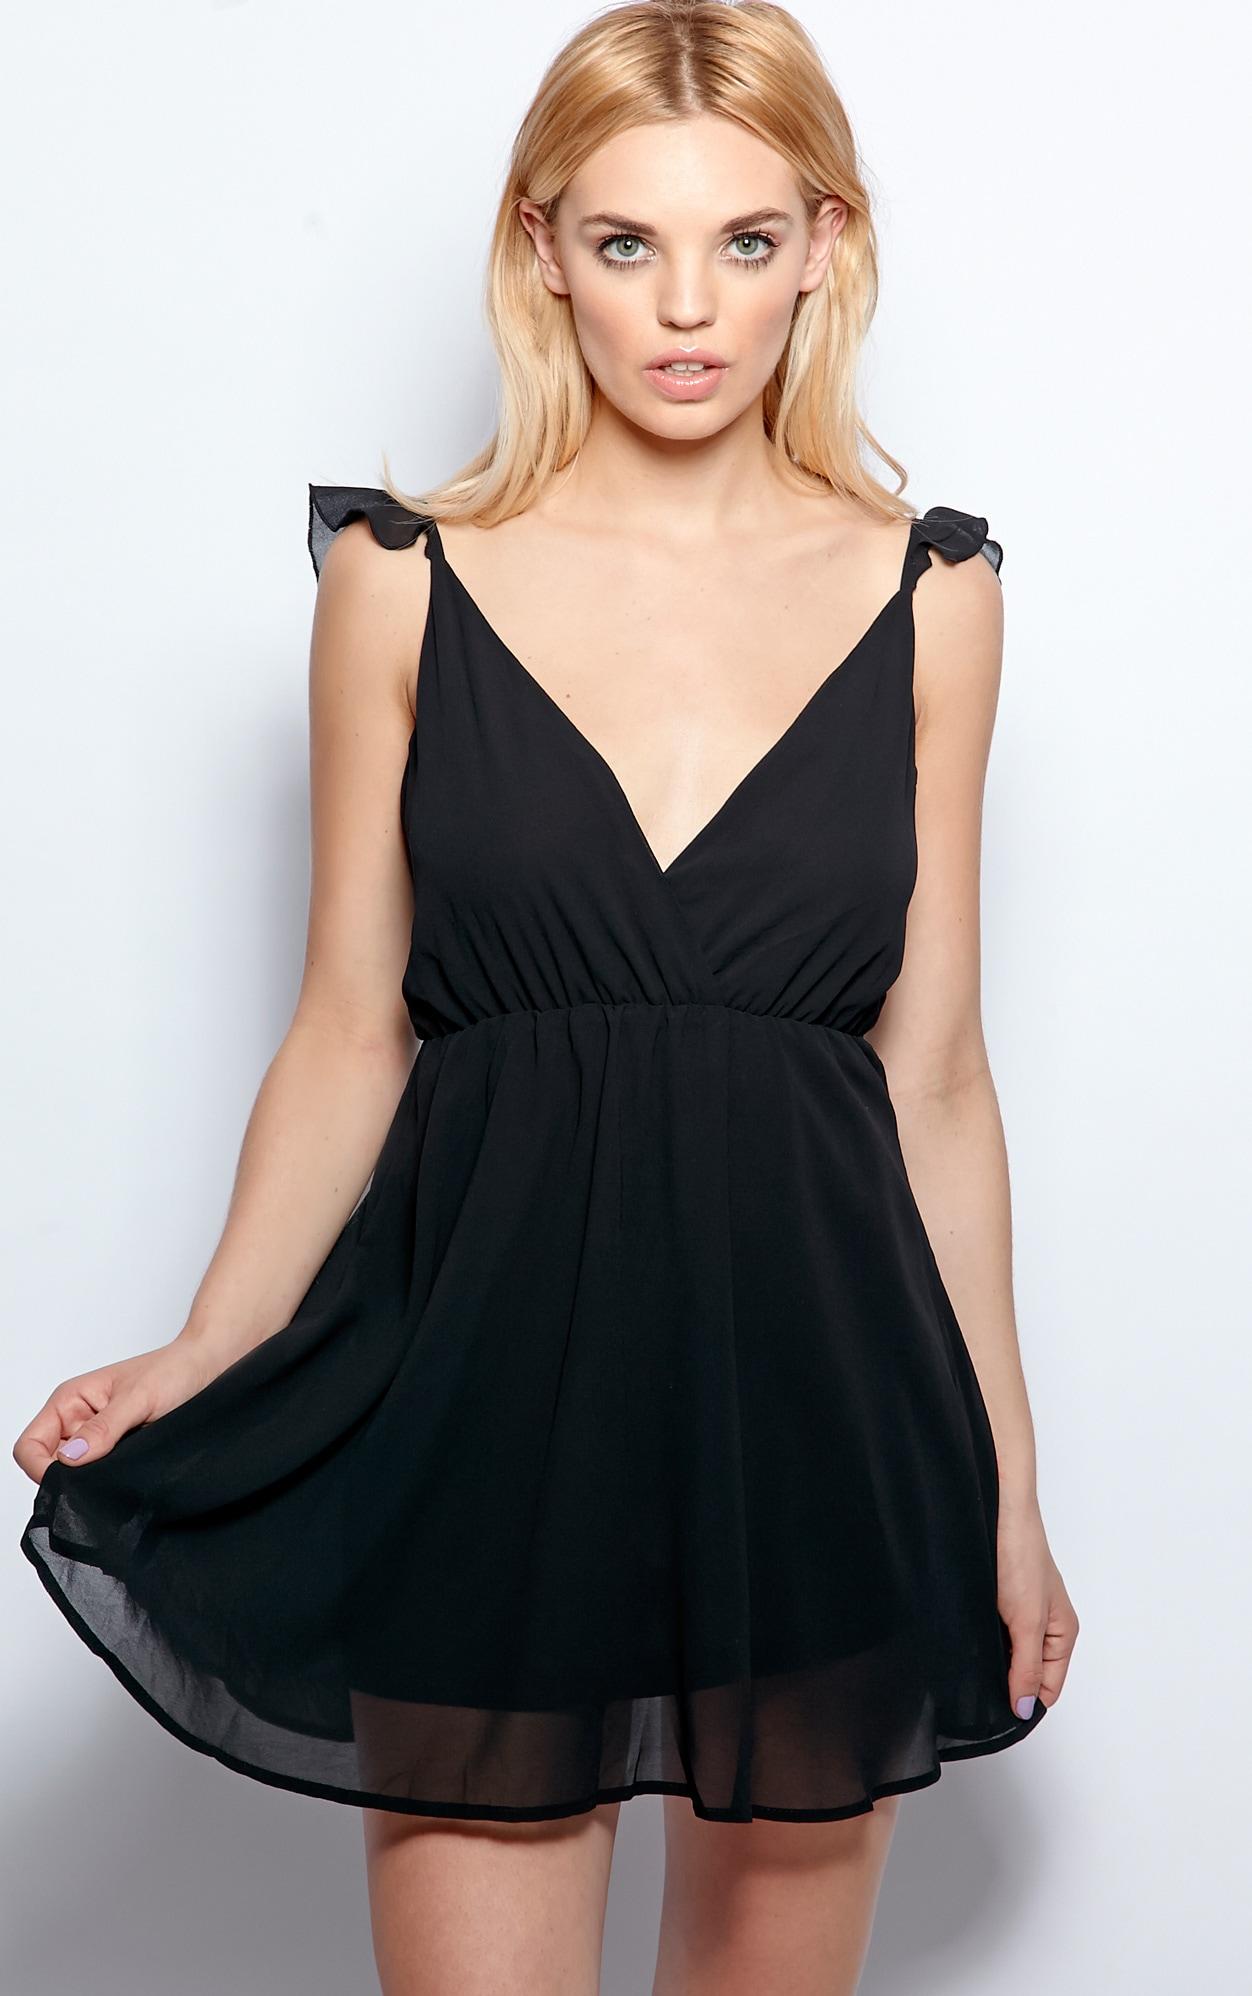 Corinne Black Chiffon Babydoll Dress 3